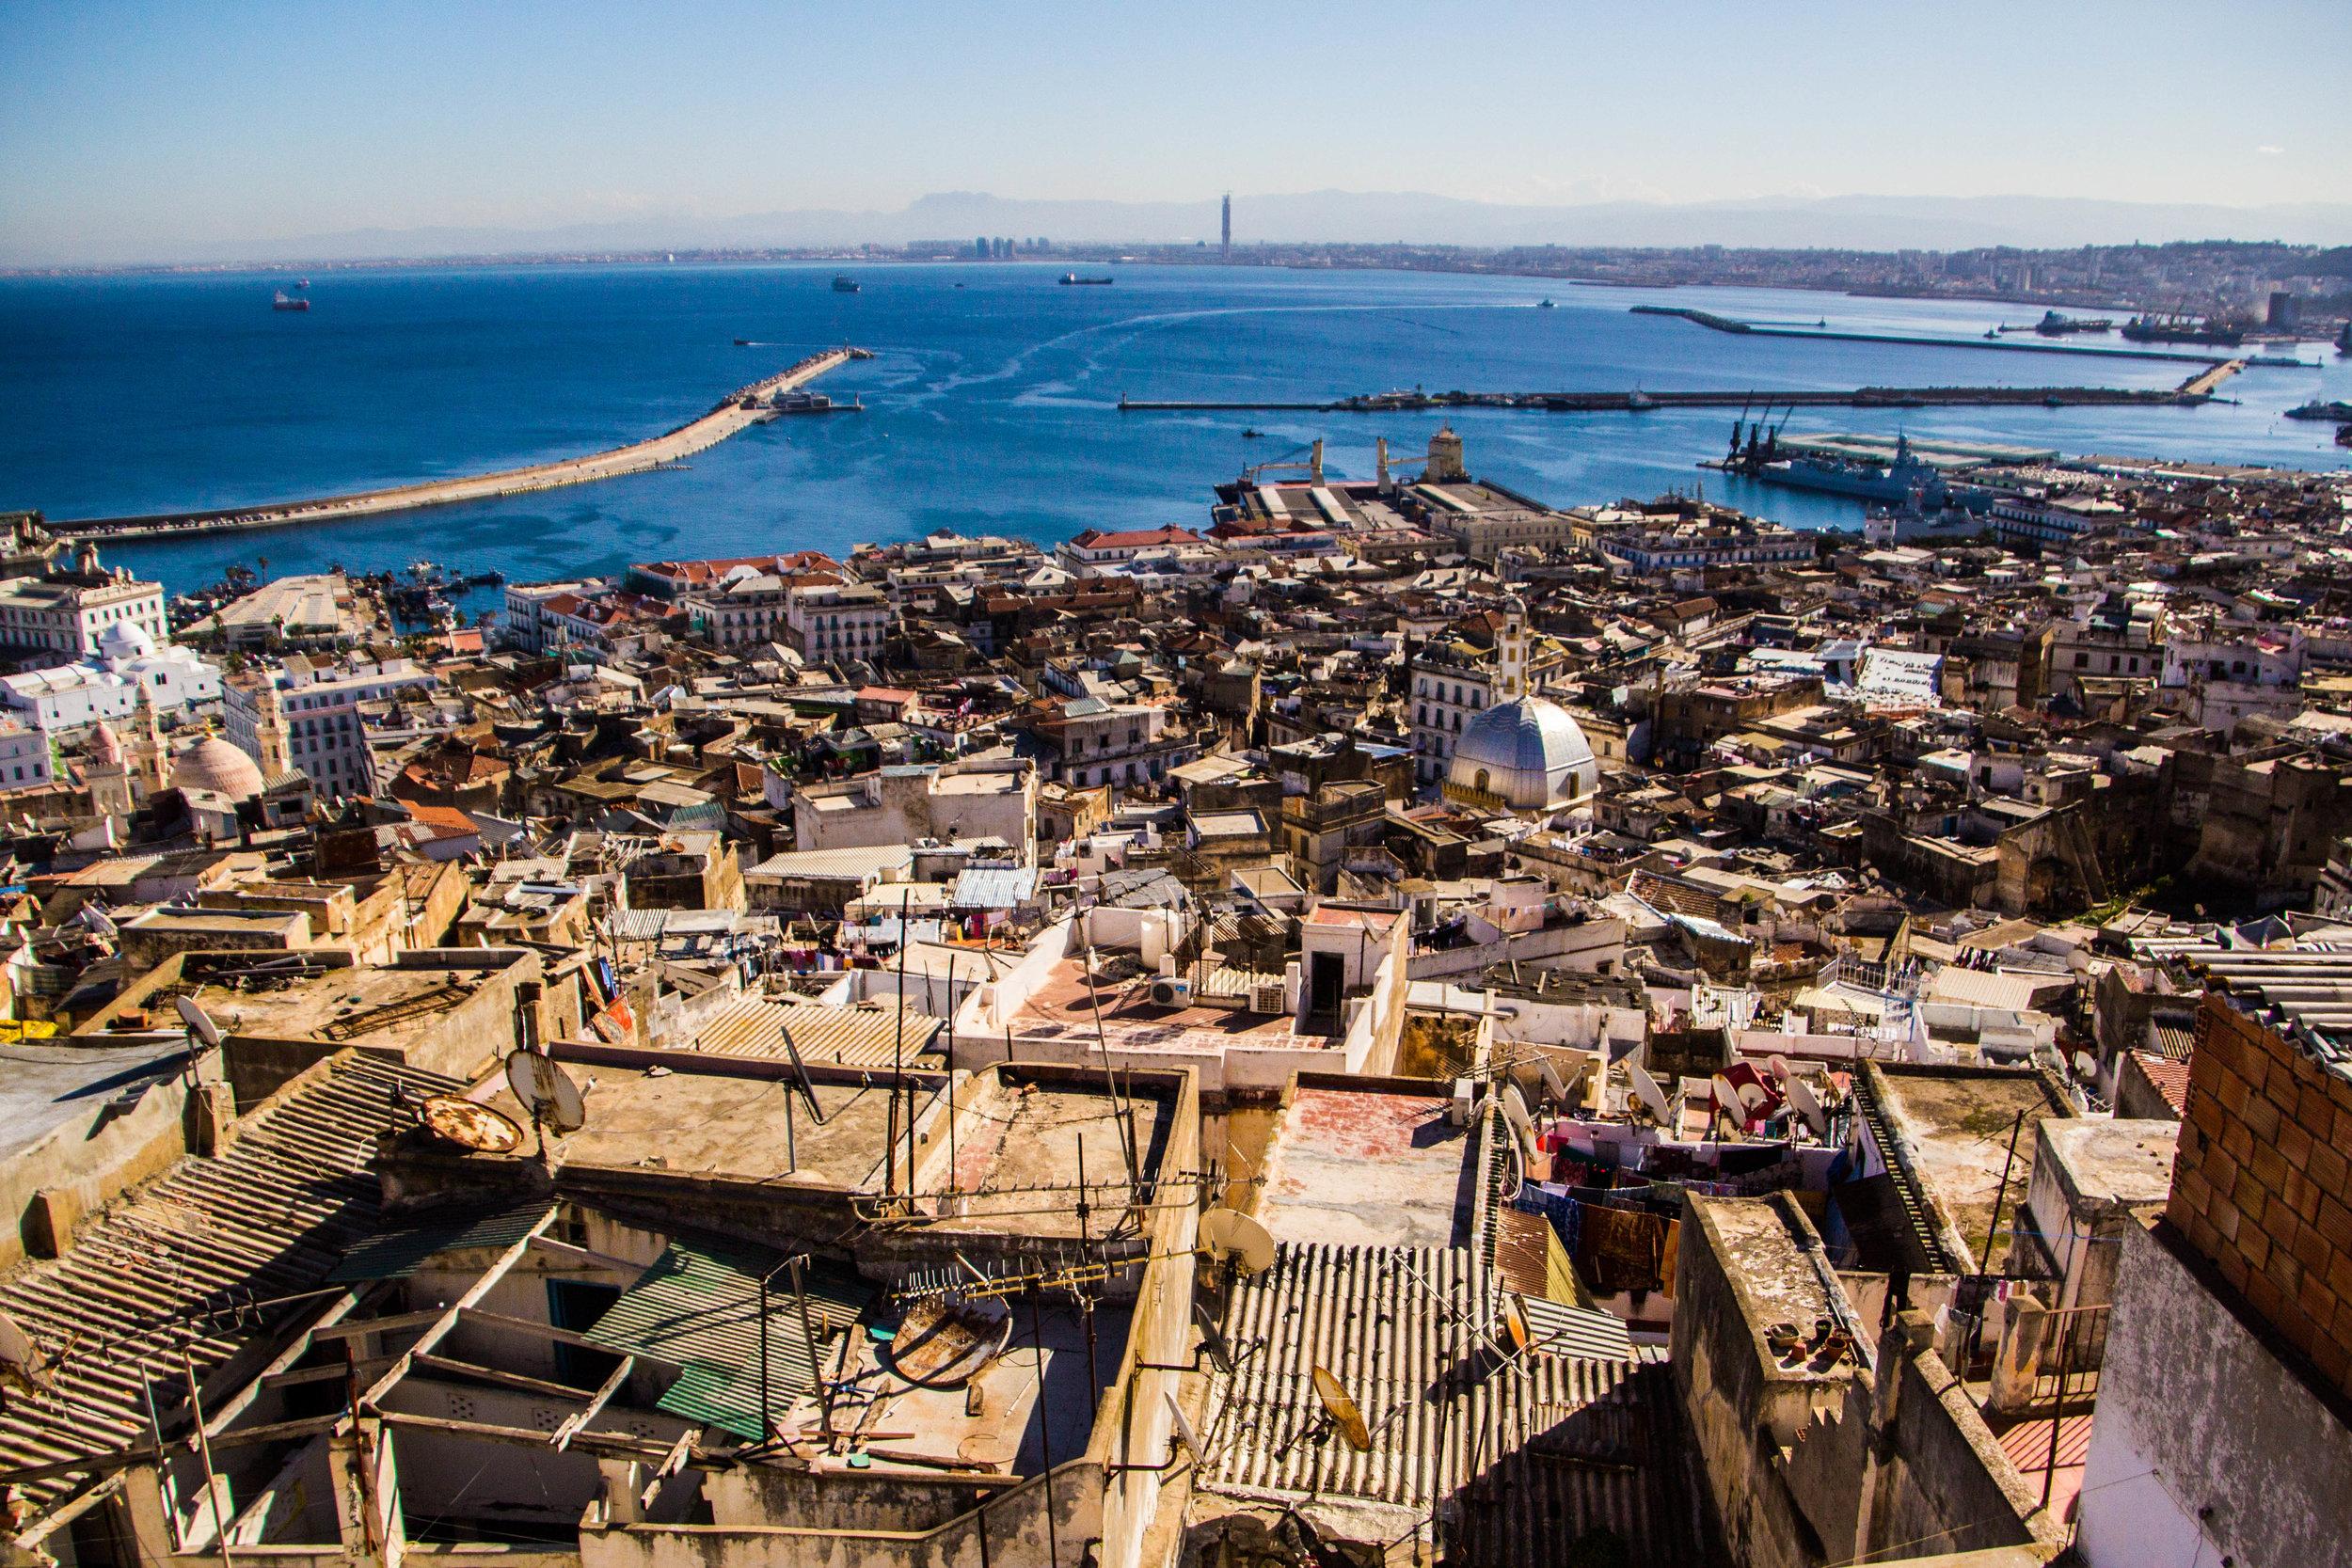 casbah-from-above-algiers-algeria-16.jpg